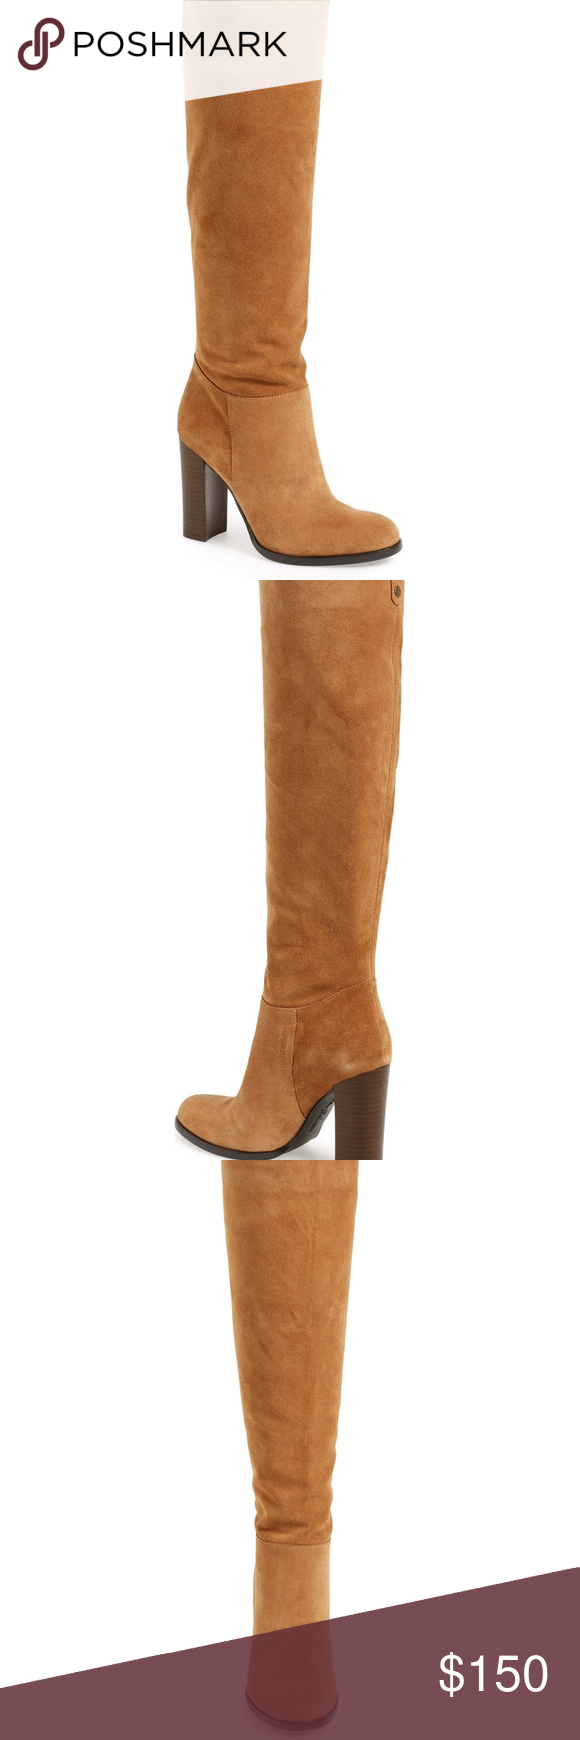 ea1811fde Sam Edelman Victoria Slouch Boot Size 11 A tall